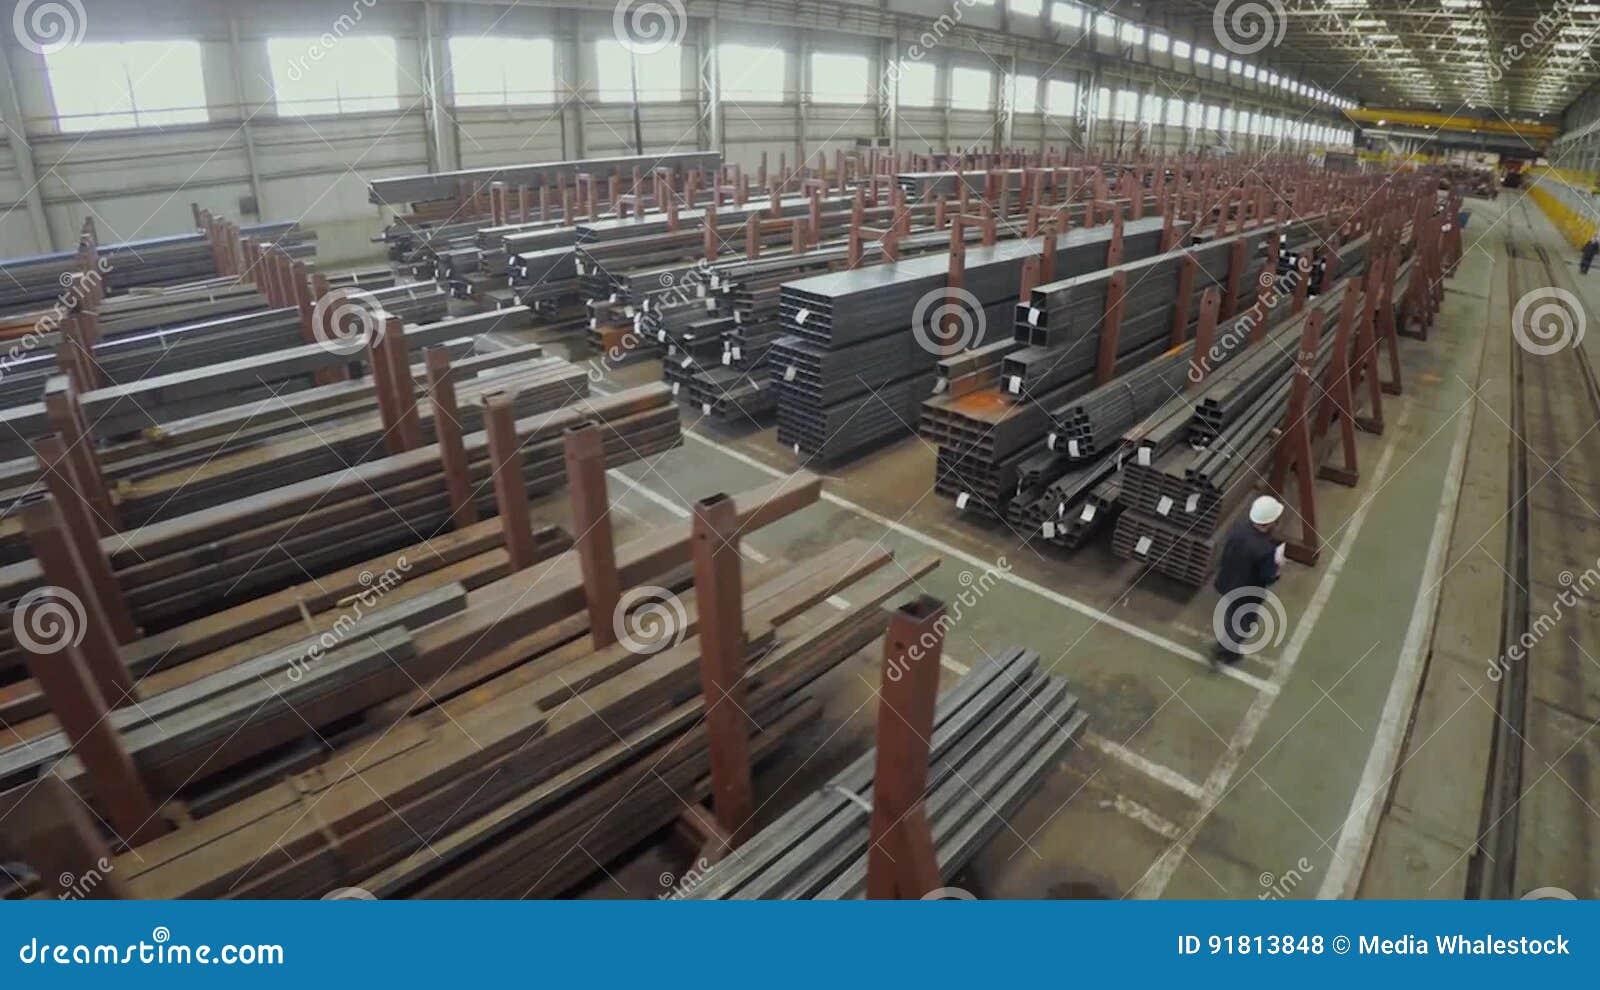 Produce factory aluminum pipes